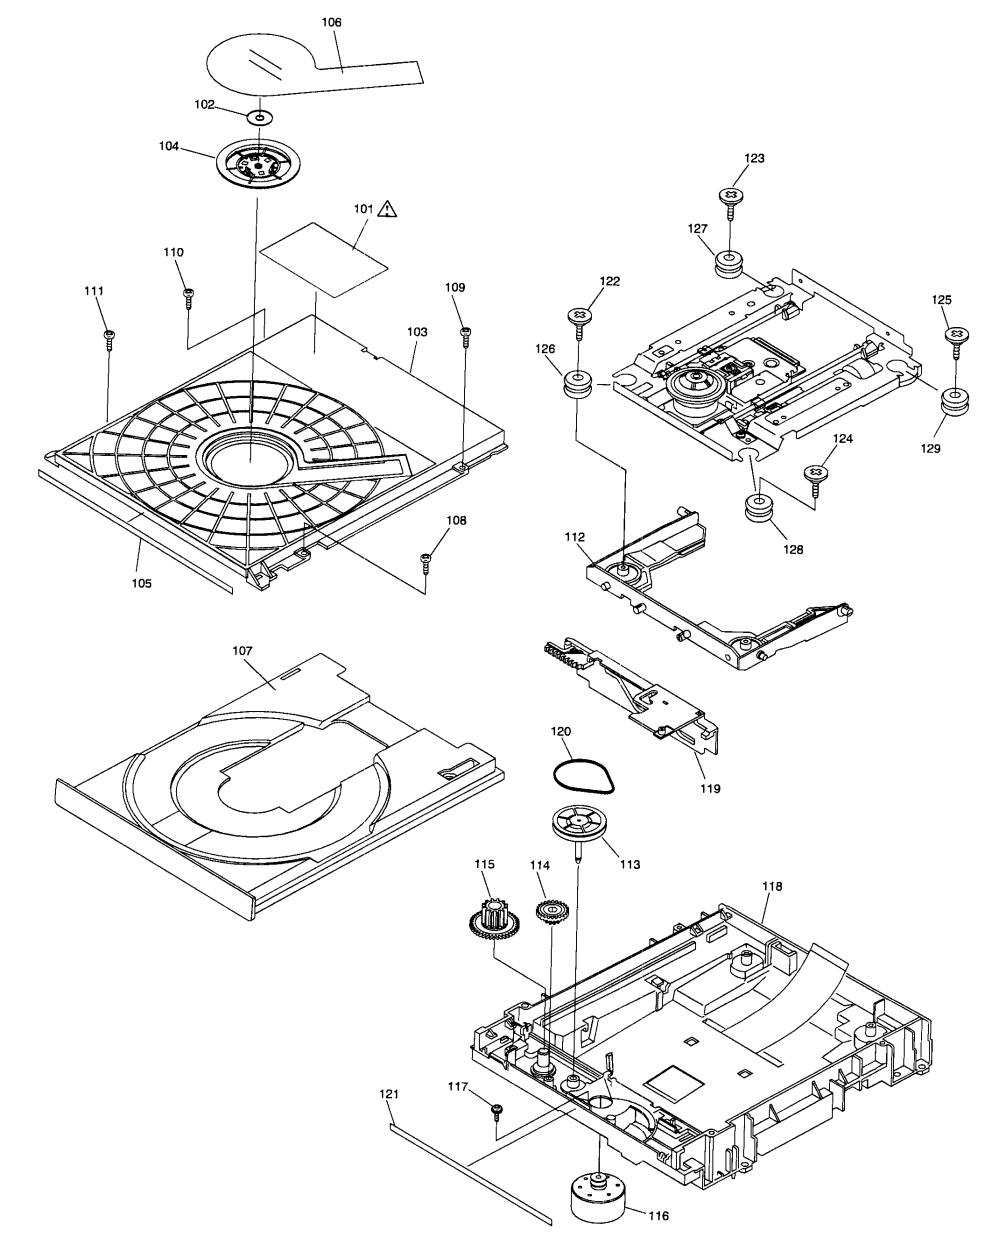 medium resolution of panasonic dmp bd80p dvd mechanism diagram